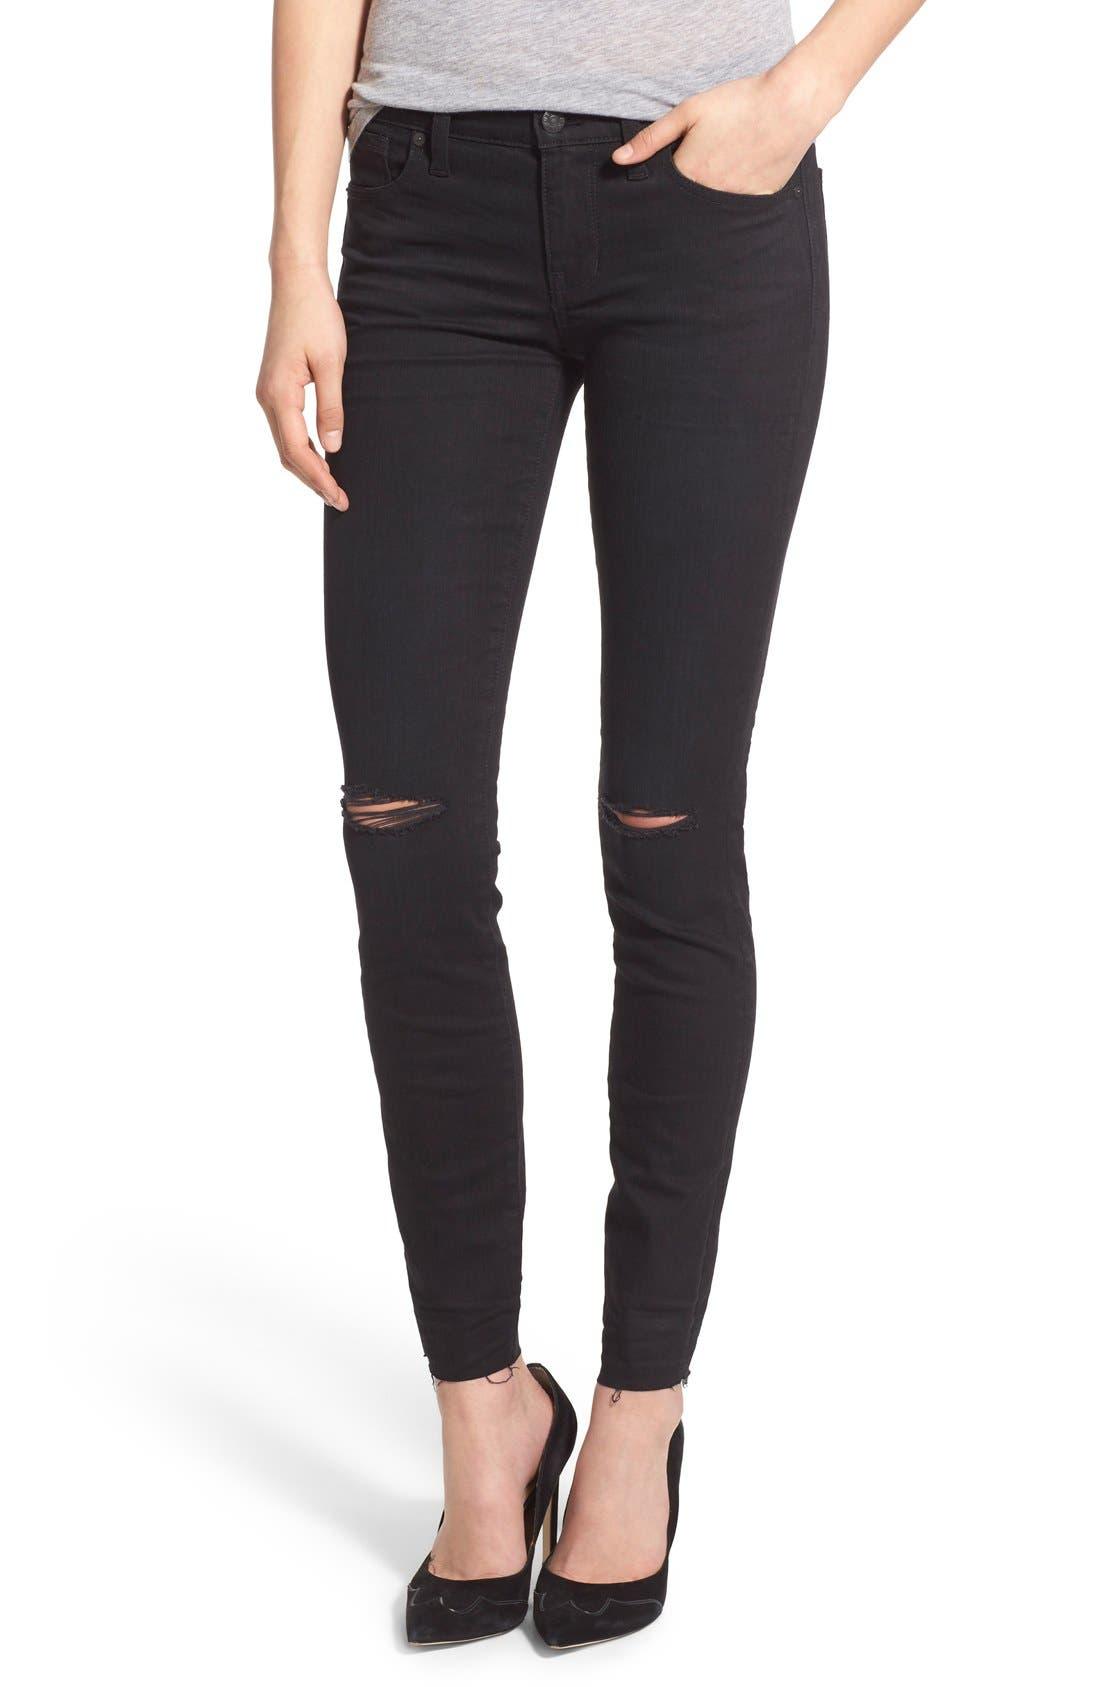 Main Image - Madewell 'Skinny Skinny' Knee Rip Jeans (Trent Wash) (Long)